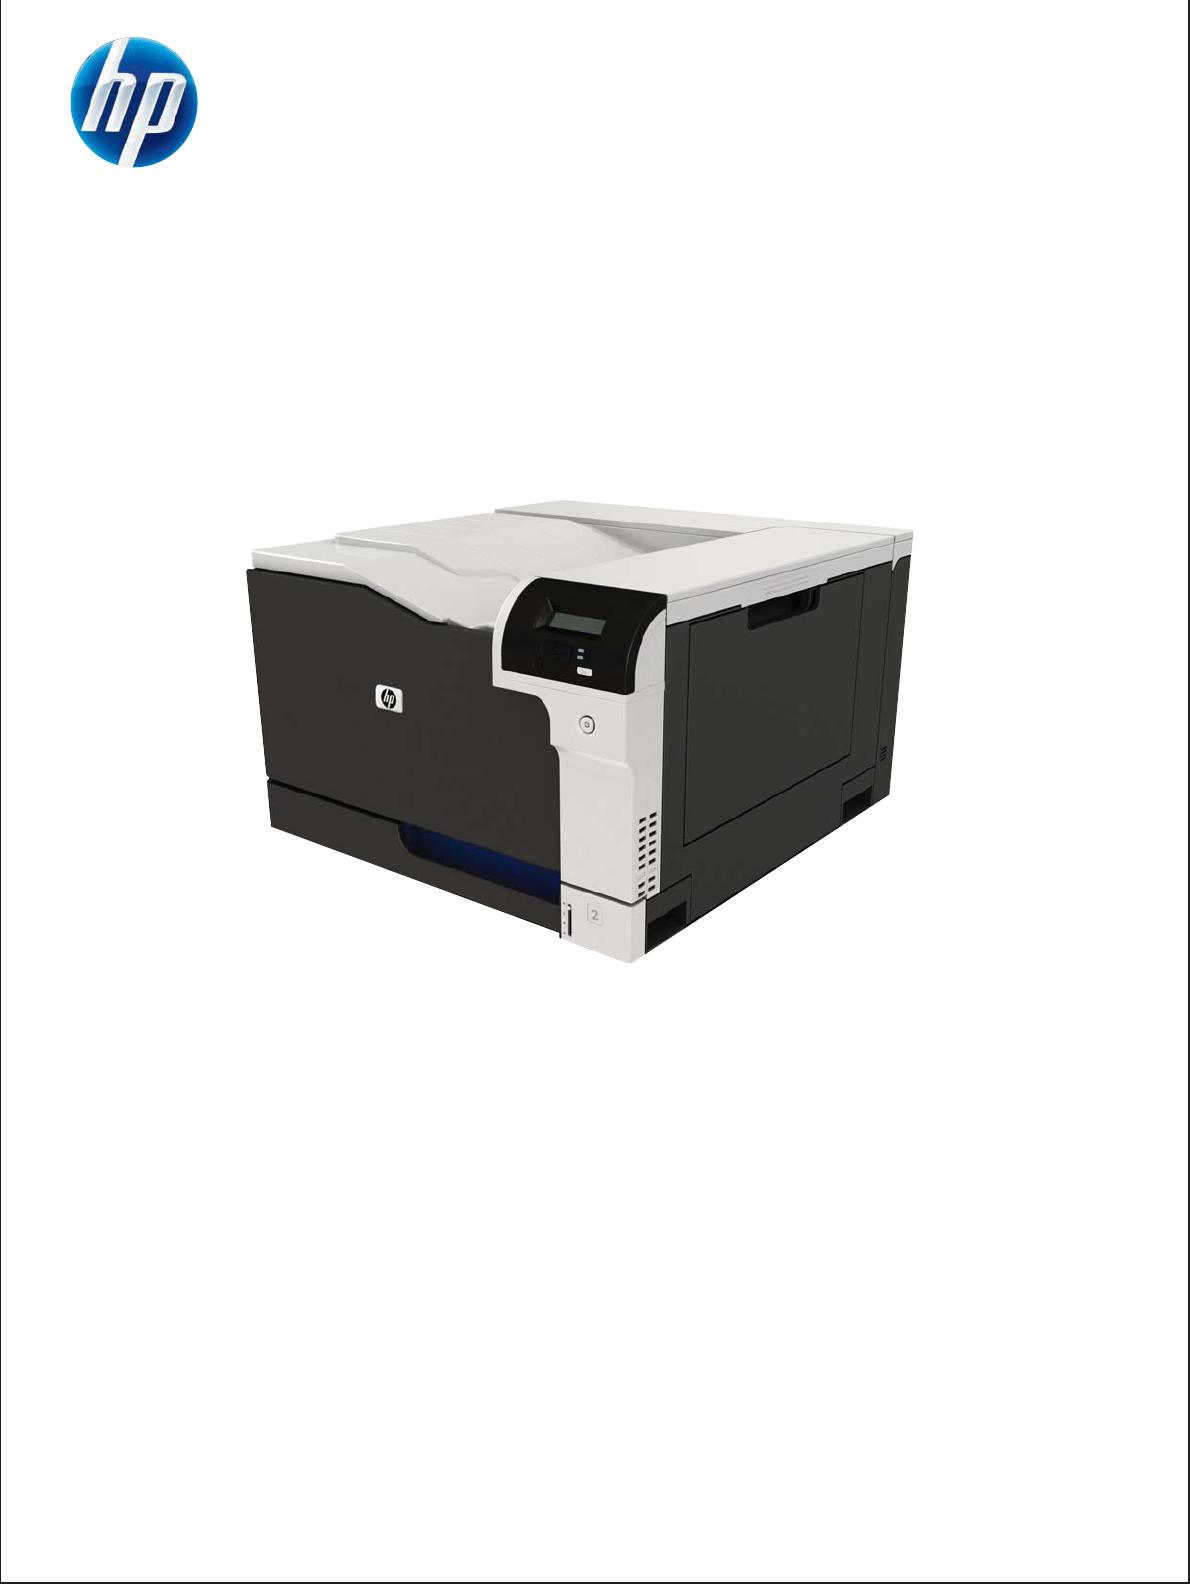 HP RK2-2728-000CN RK2-2728 LJ Printer Fan